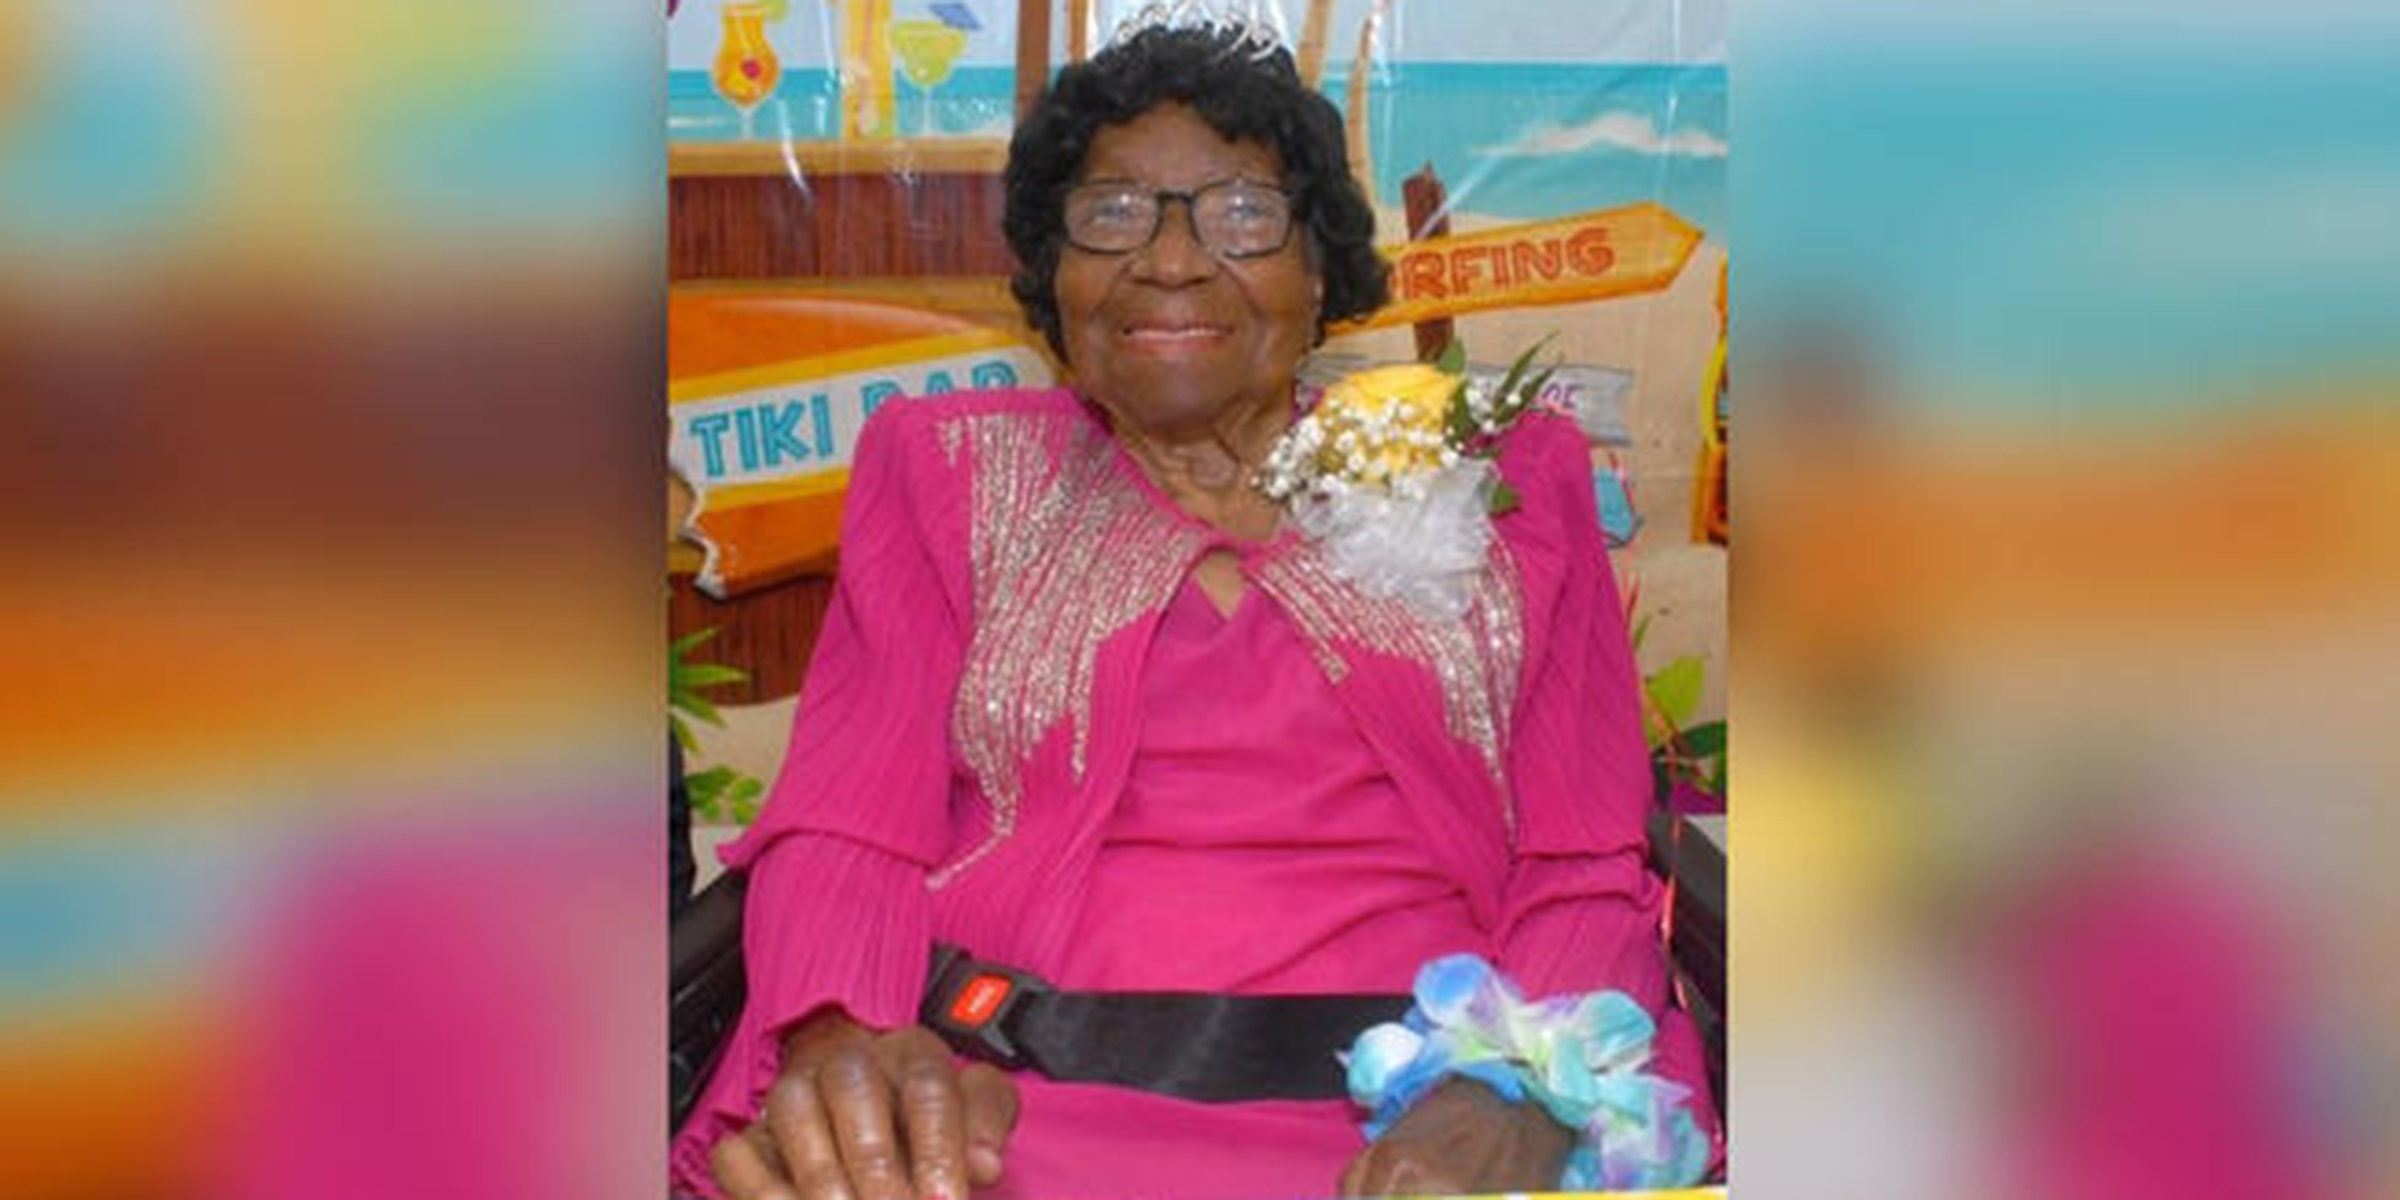 Alelia Murphy, oldest living American, turns 114 years old in Harlem